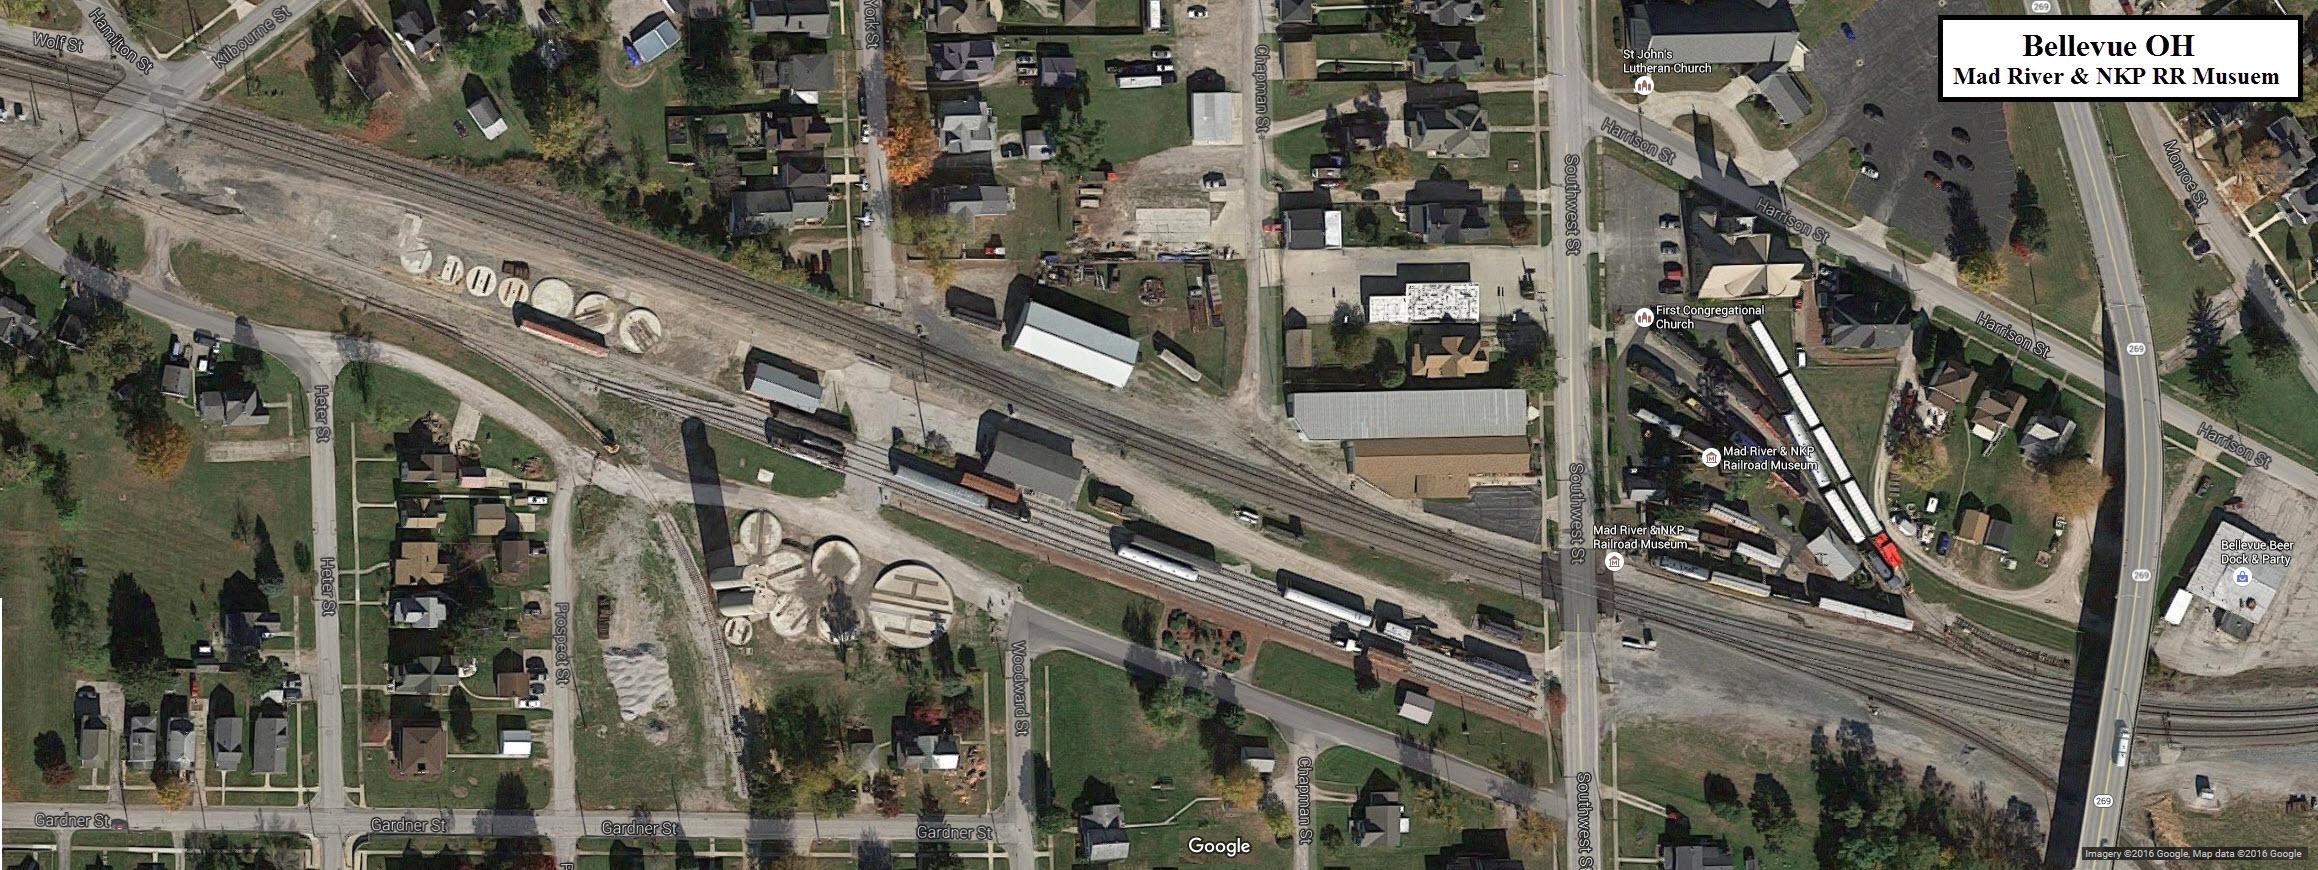 Bellevue OH Railfan Guide - Us railroad map 2016 ohio